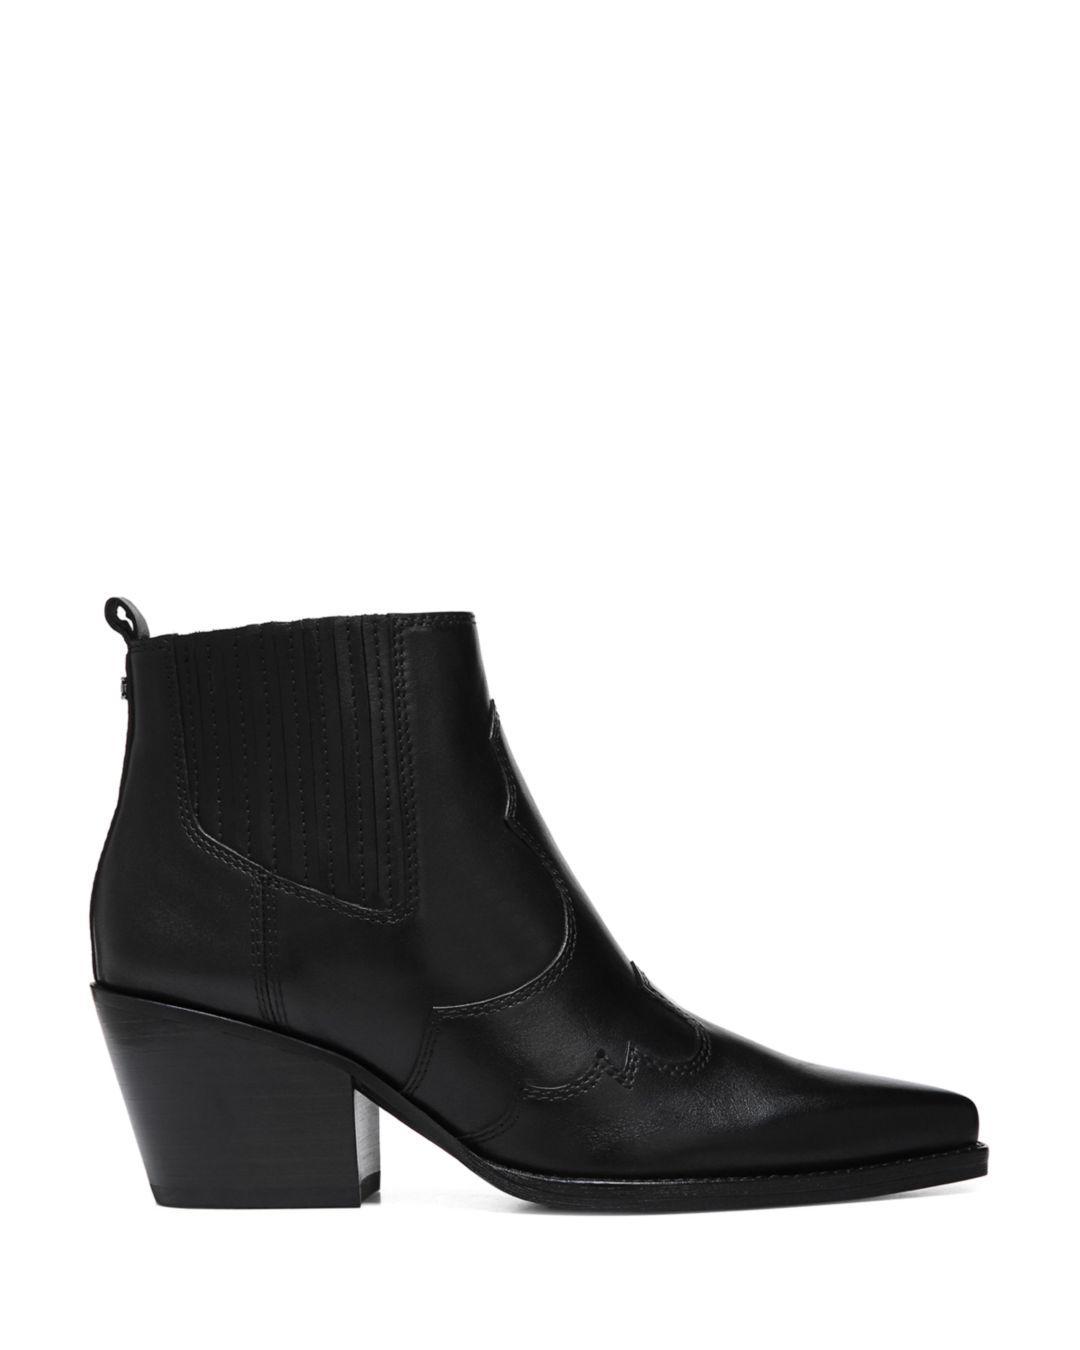 14c9b8f7aea149 Lyst - Sam Edelman Women s Winona Pointed-toe Mid-heel Leather Booties in  Black